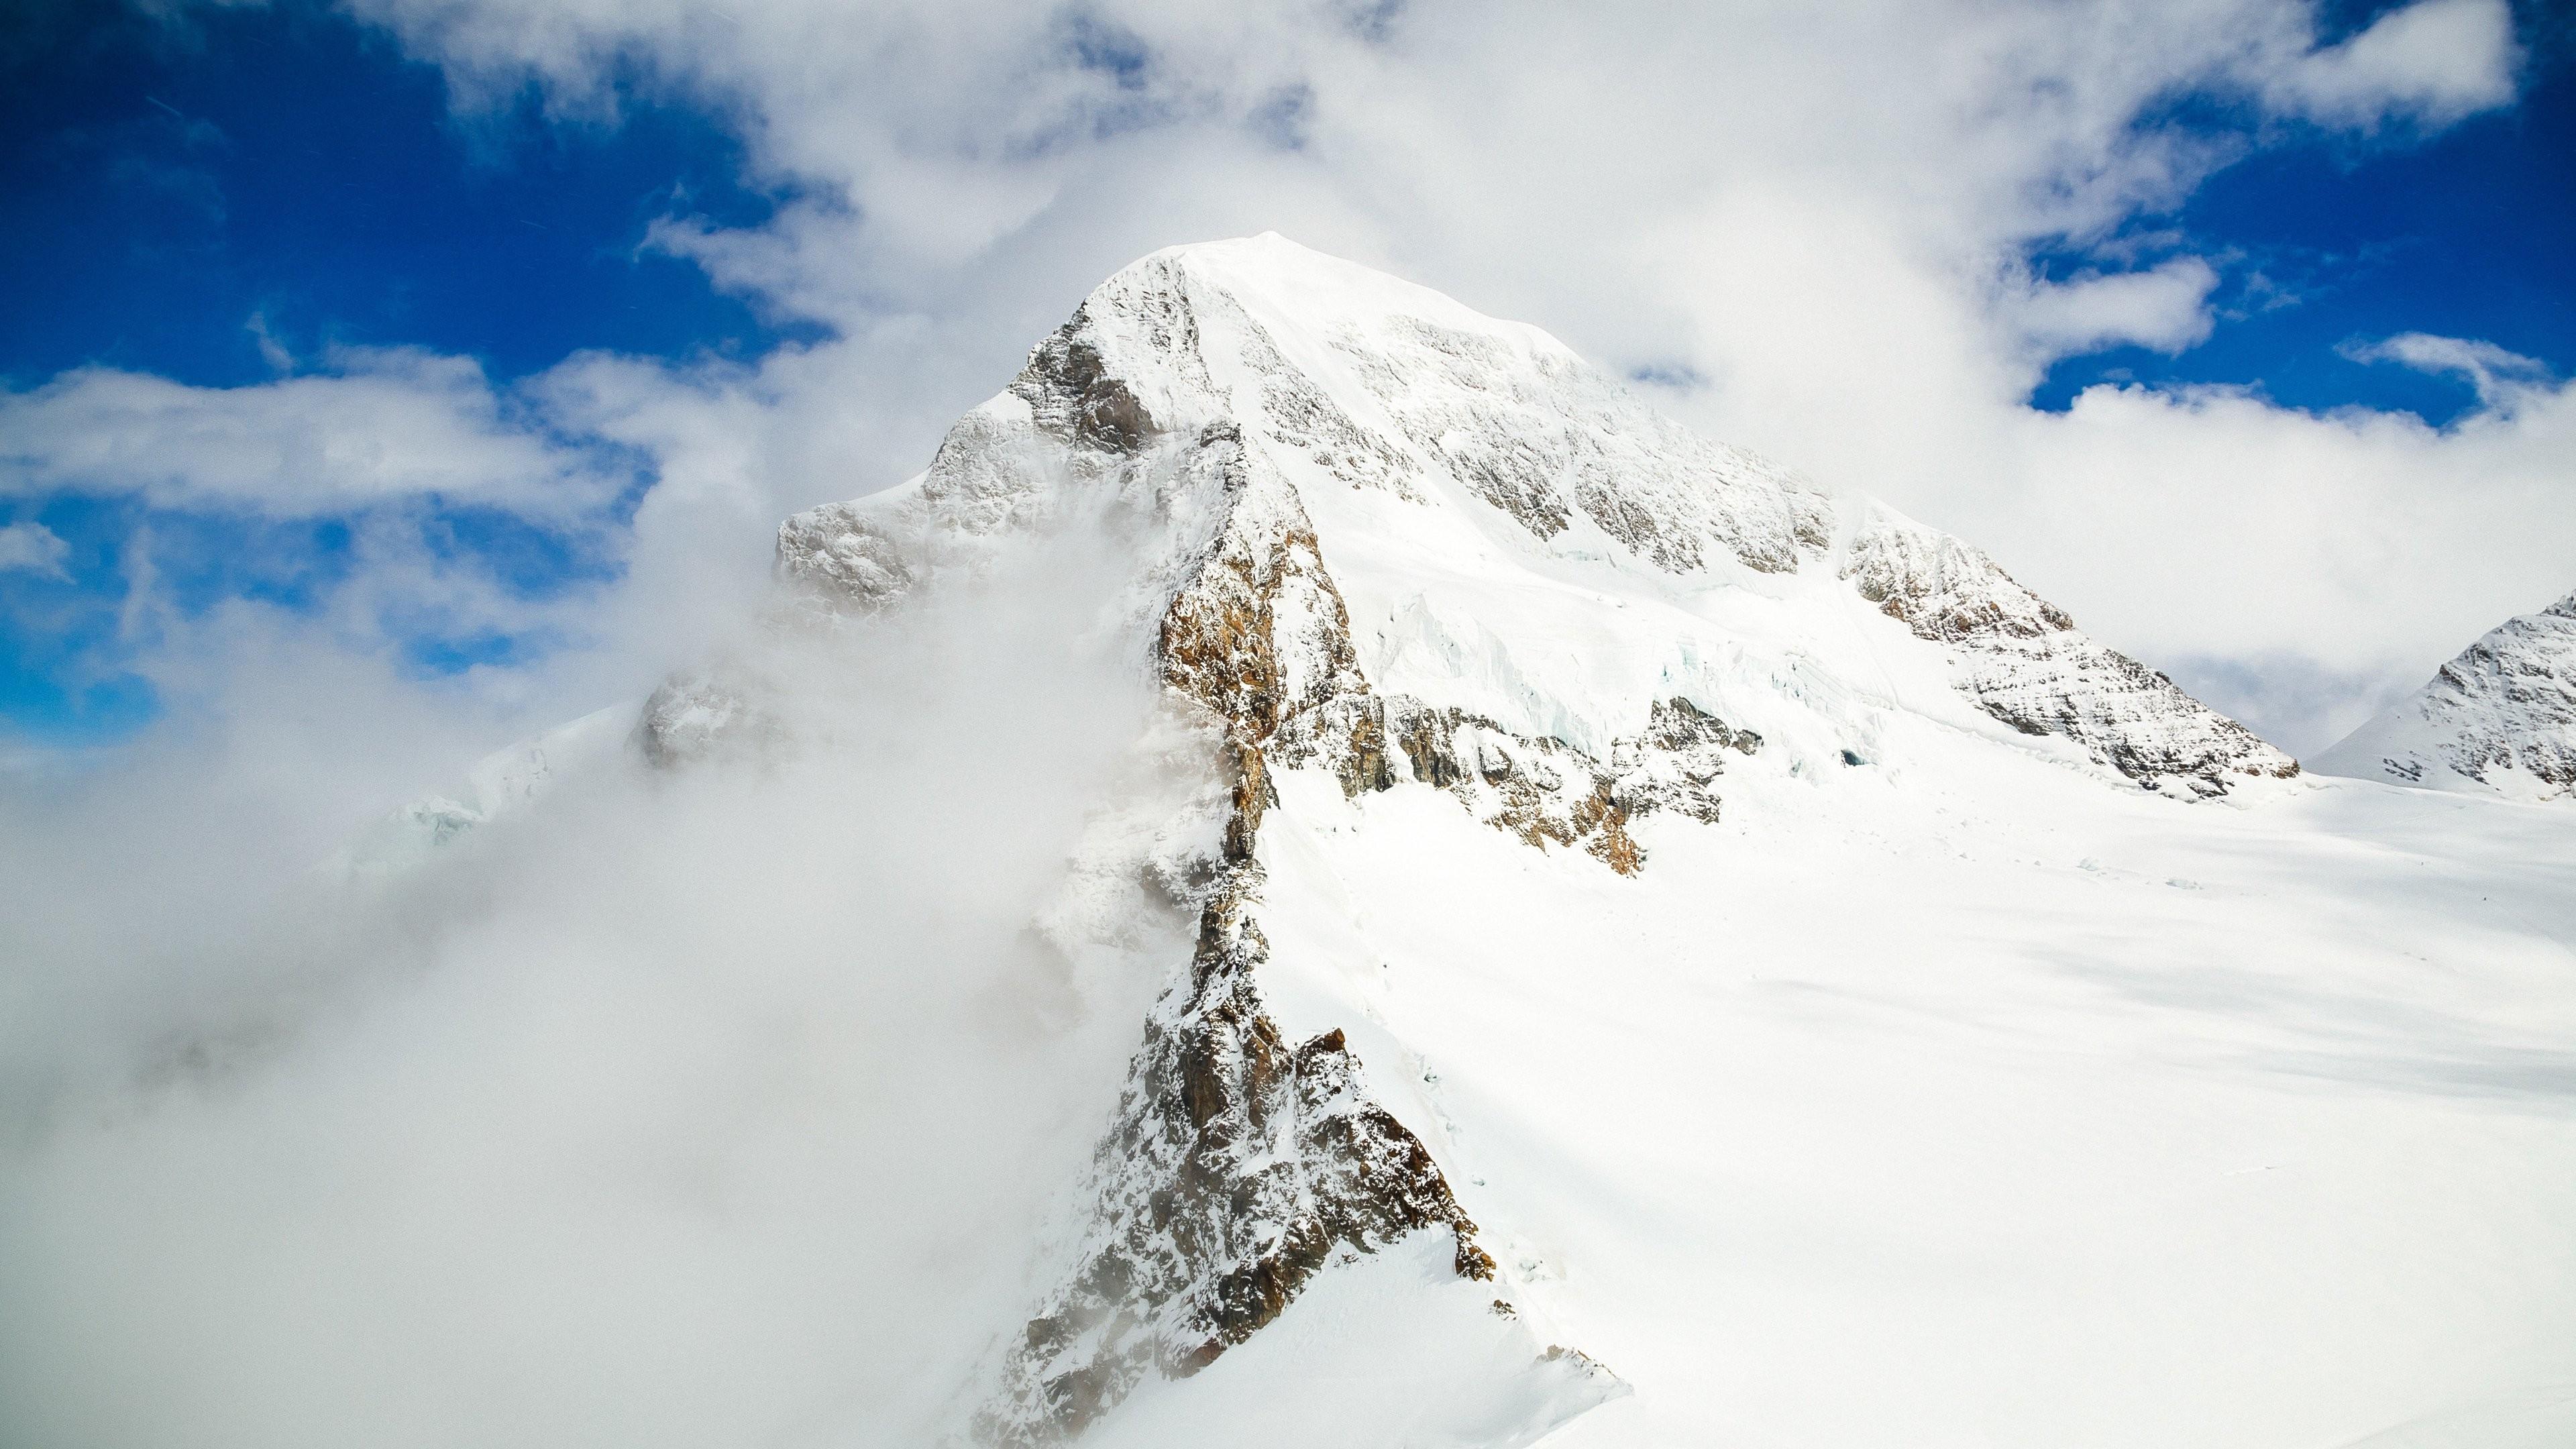 Simple Wallpaper Mountain Winter - snow-mountains-3840x2160-4k-hd-wallpaper-snow-winter-11203  Graphic_100754.jpg